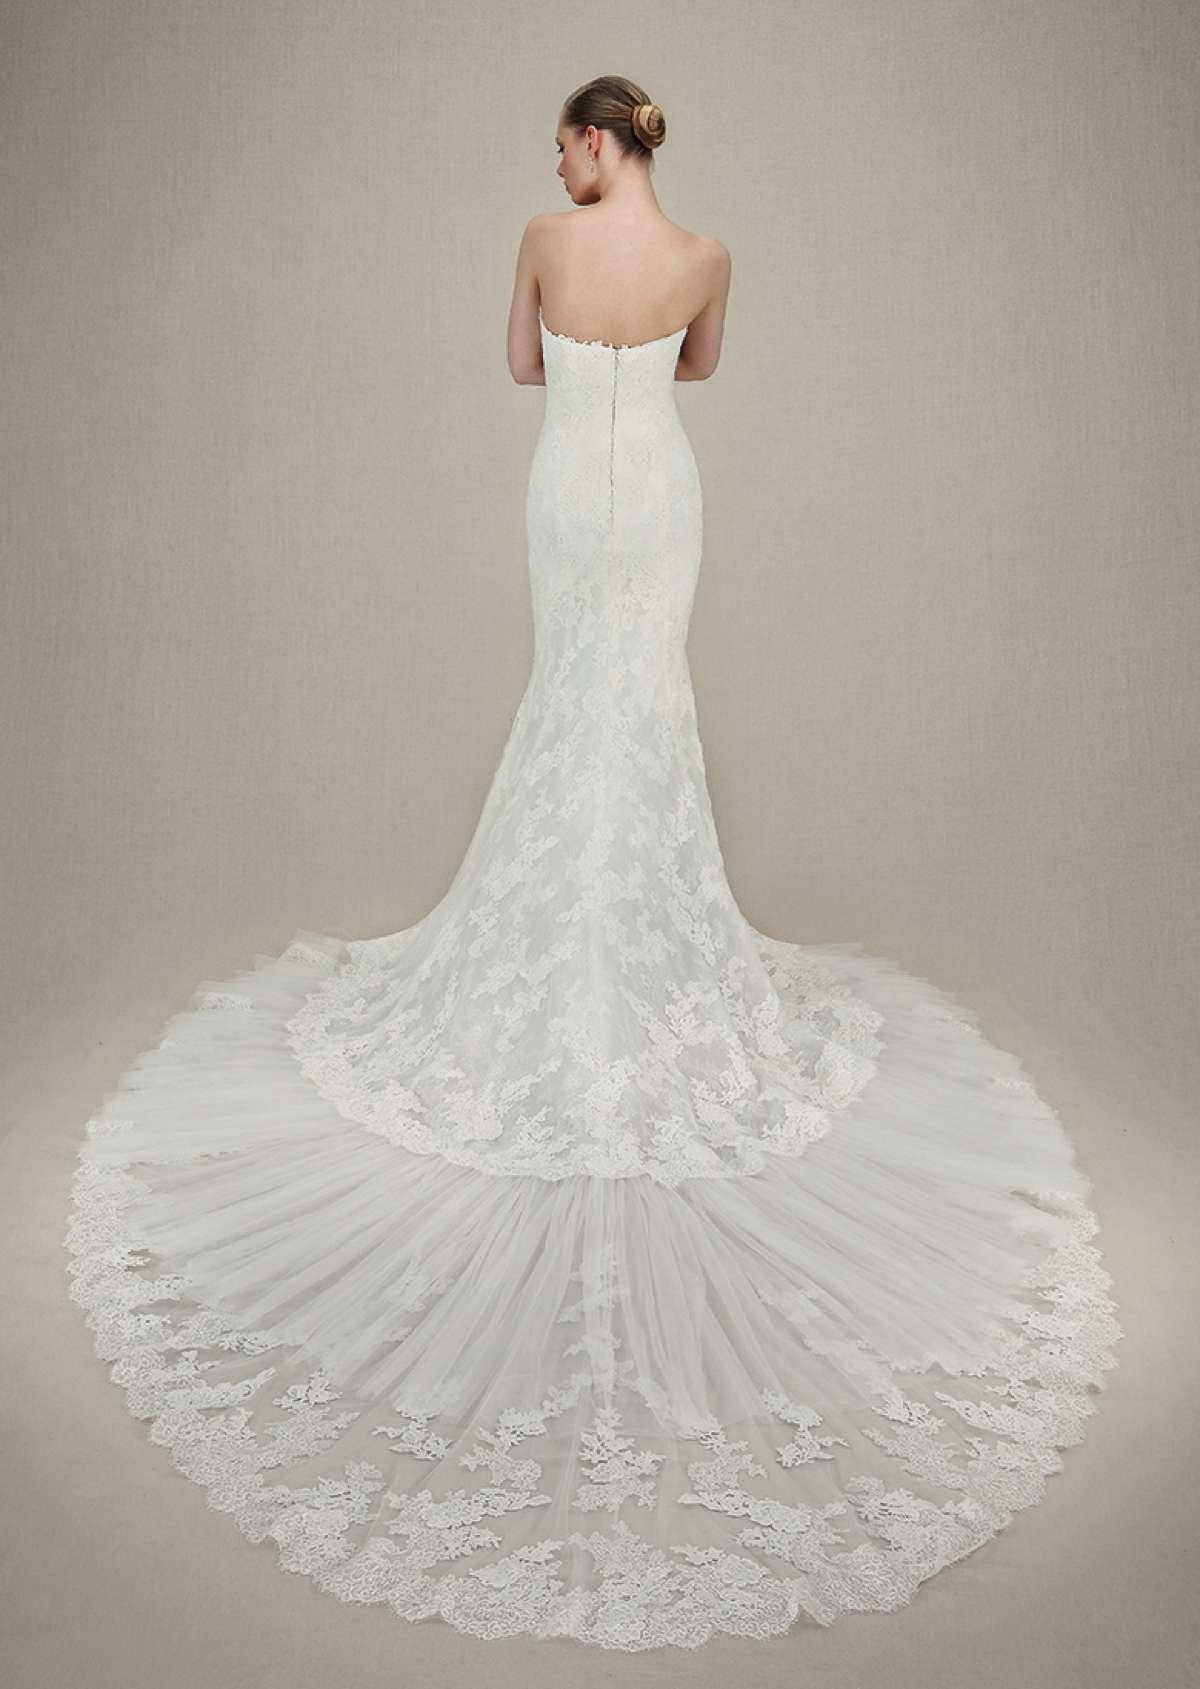 Harrogate Bridal Show Trends - Enzoani